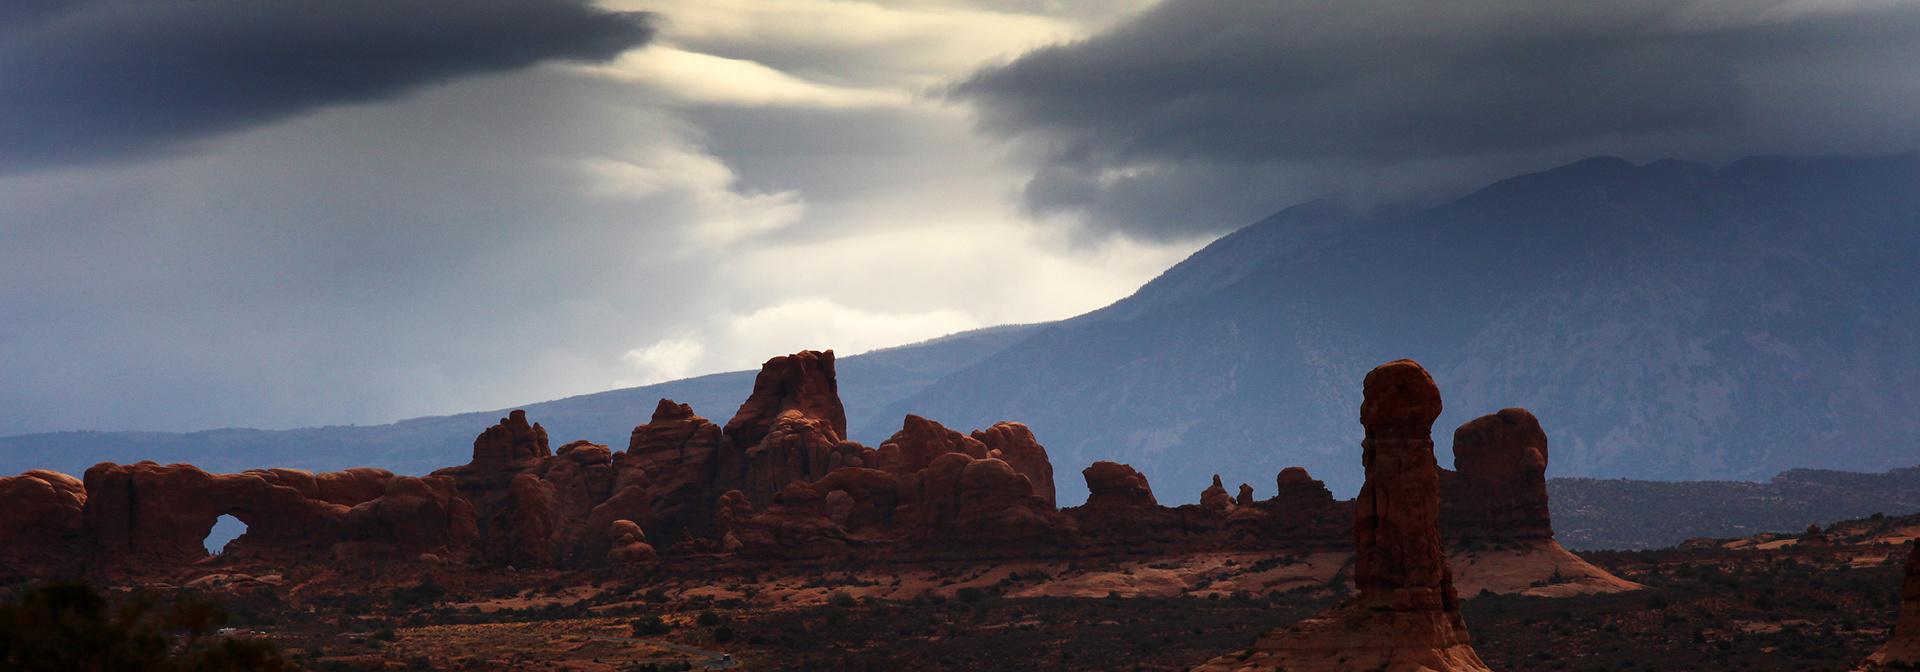 Utah: St. George & Zion National Park